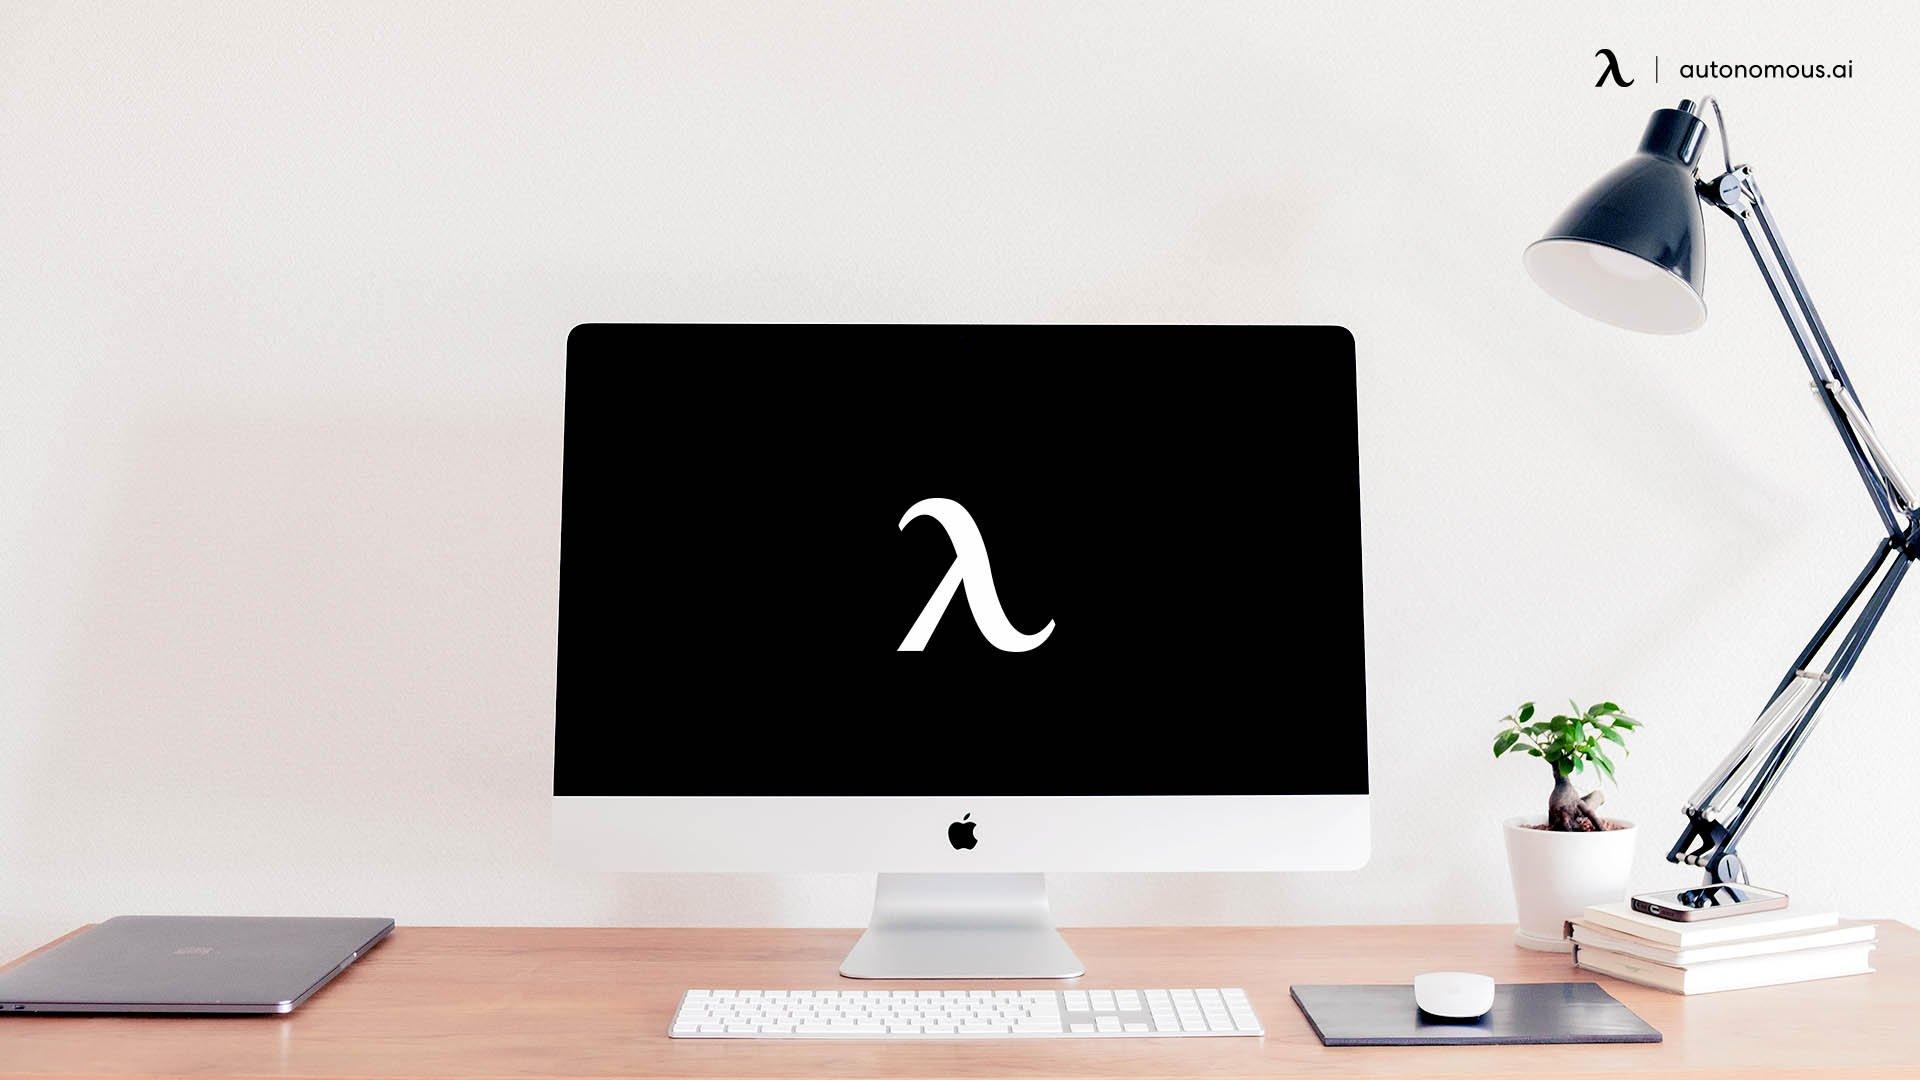 The Minimalist Desktop Set-up